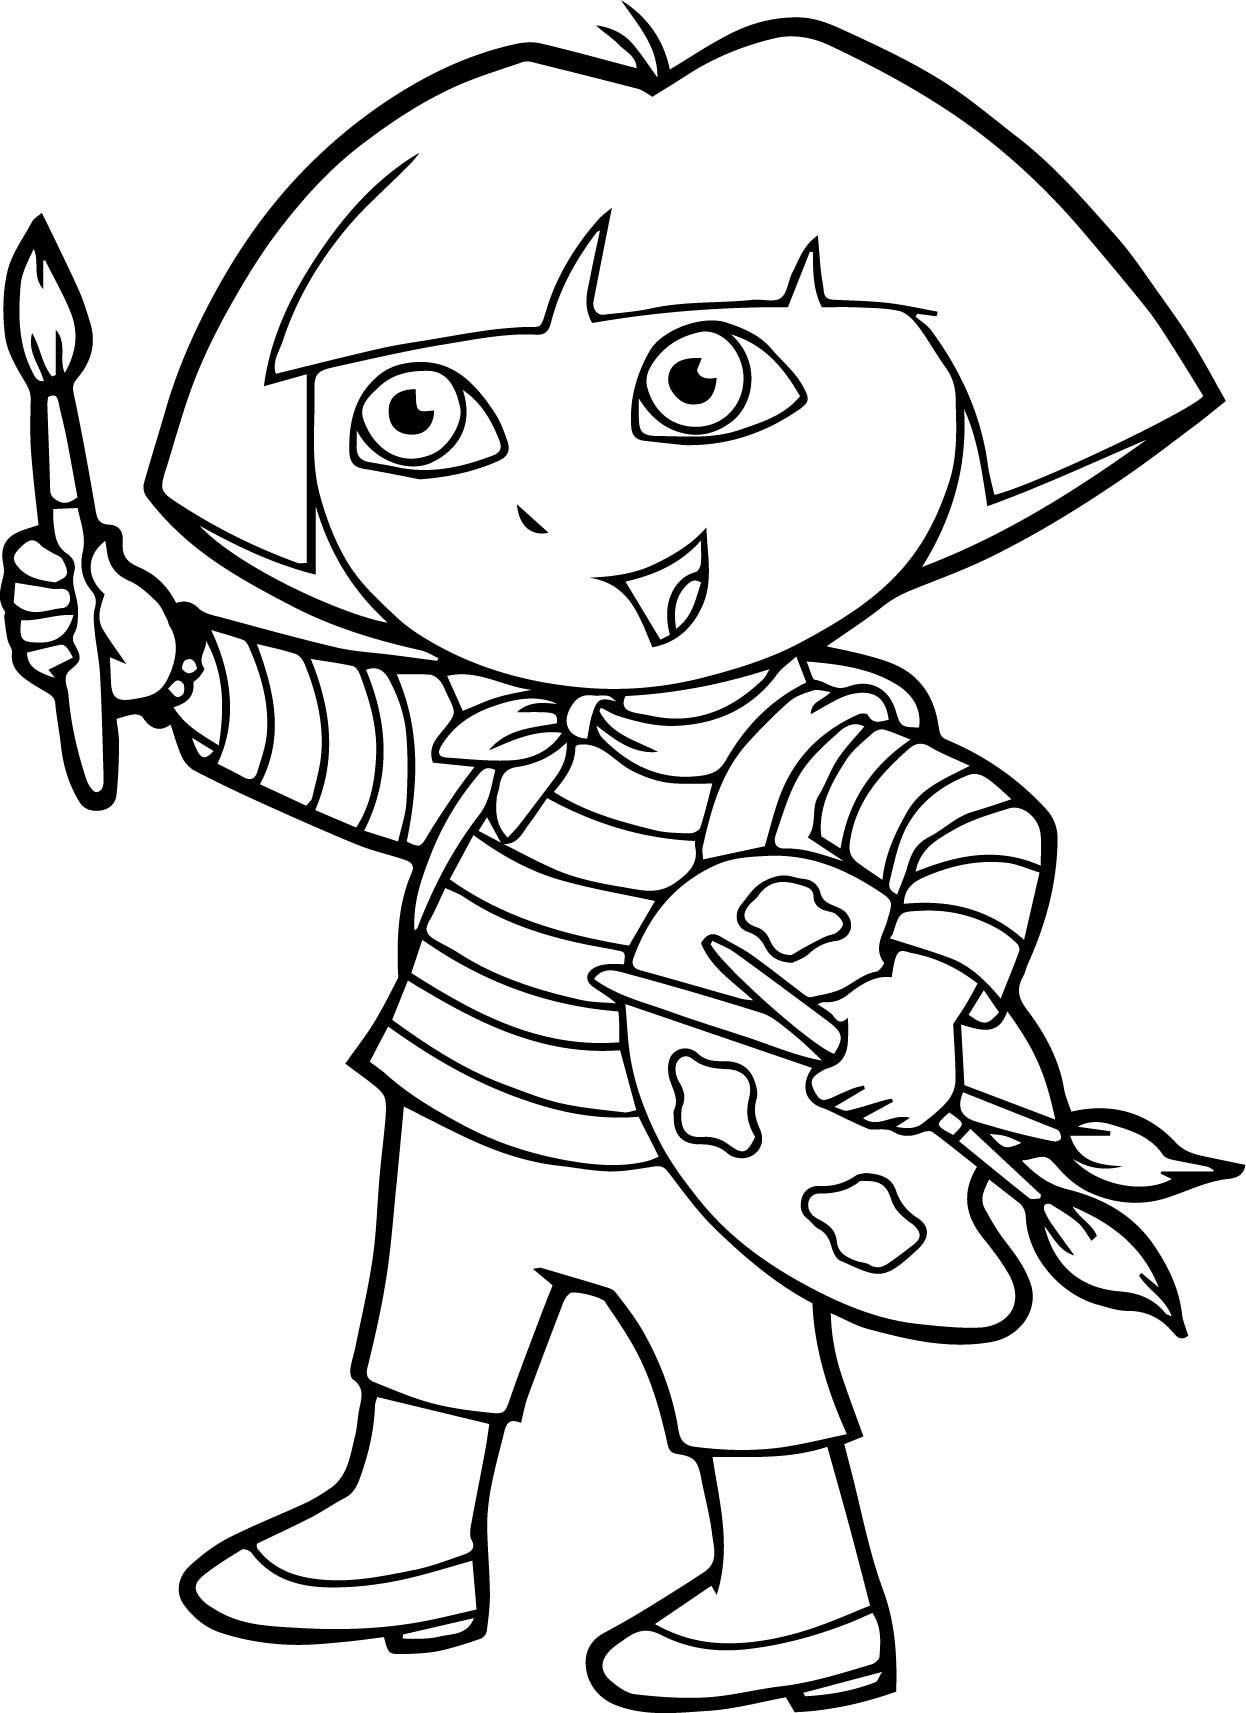 d8ce5bb250d96ef9a5770321d64987fb » Dora Picture For Kids To Color